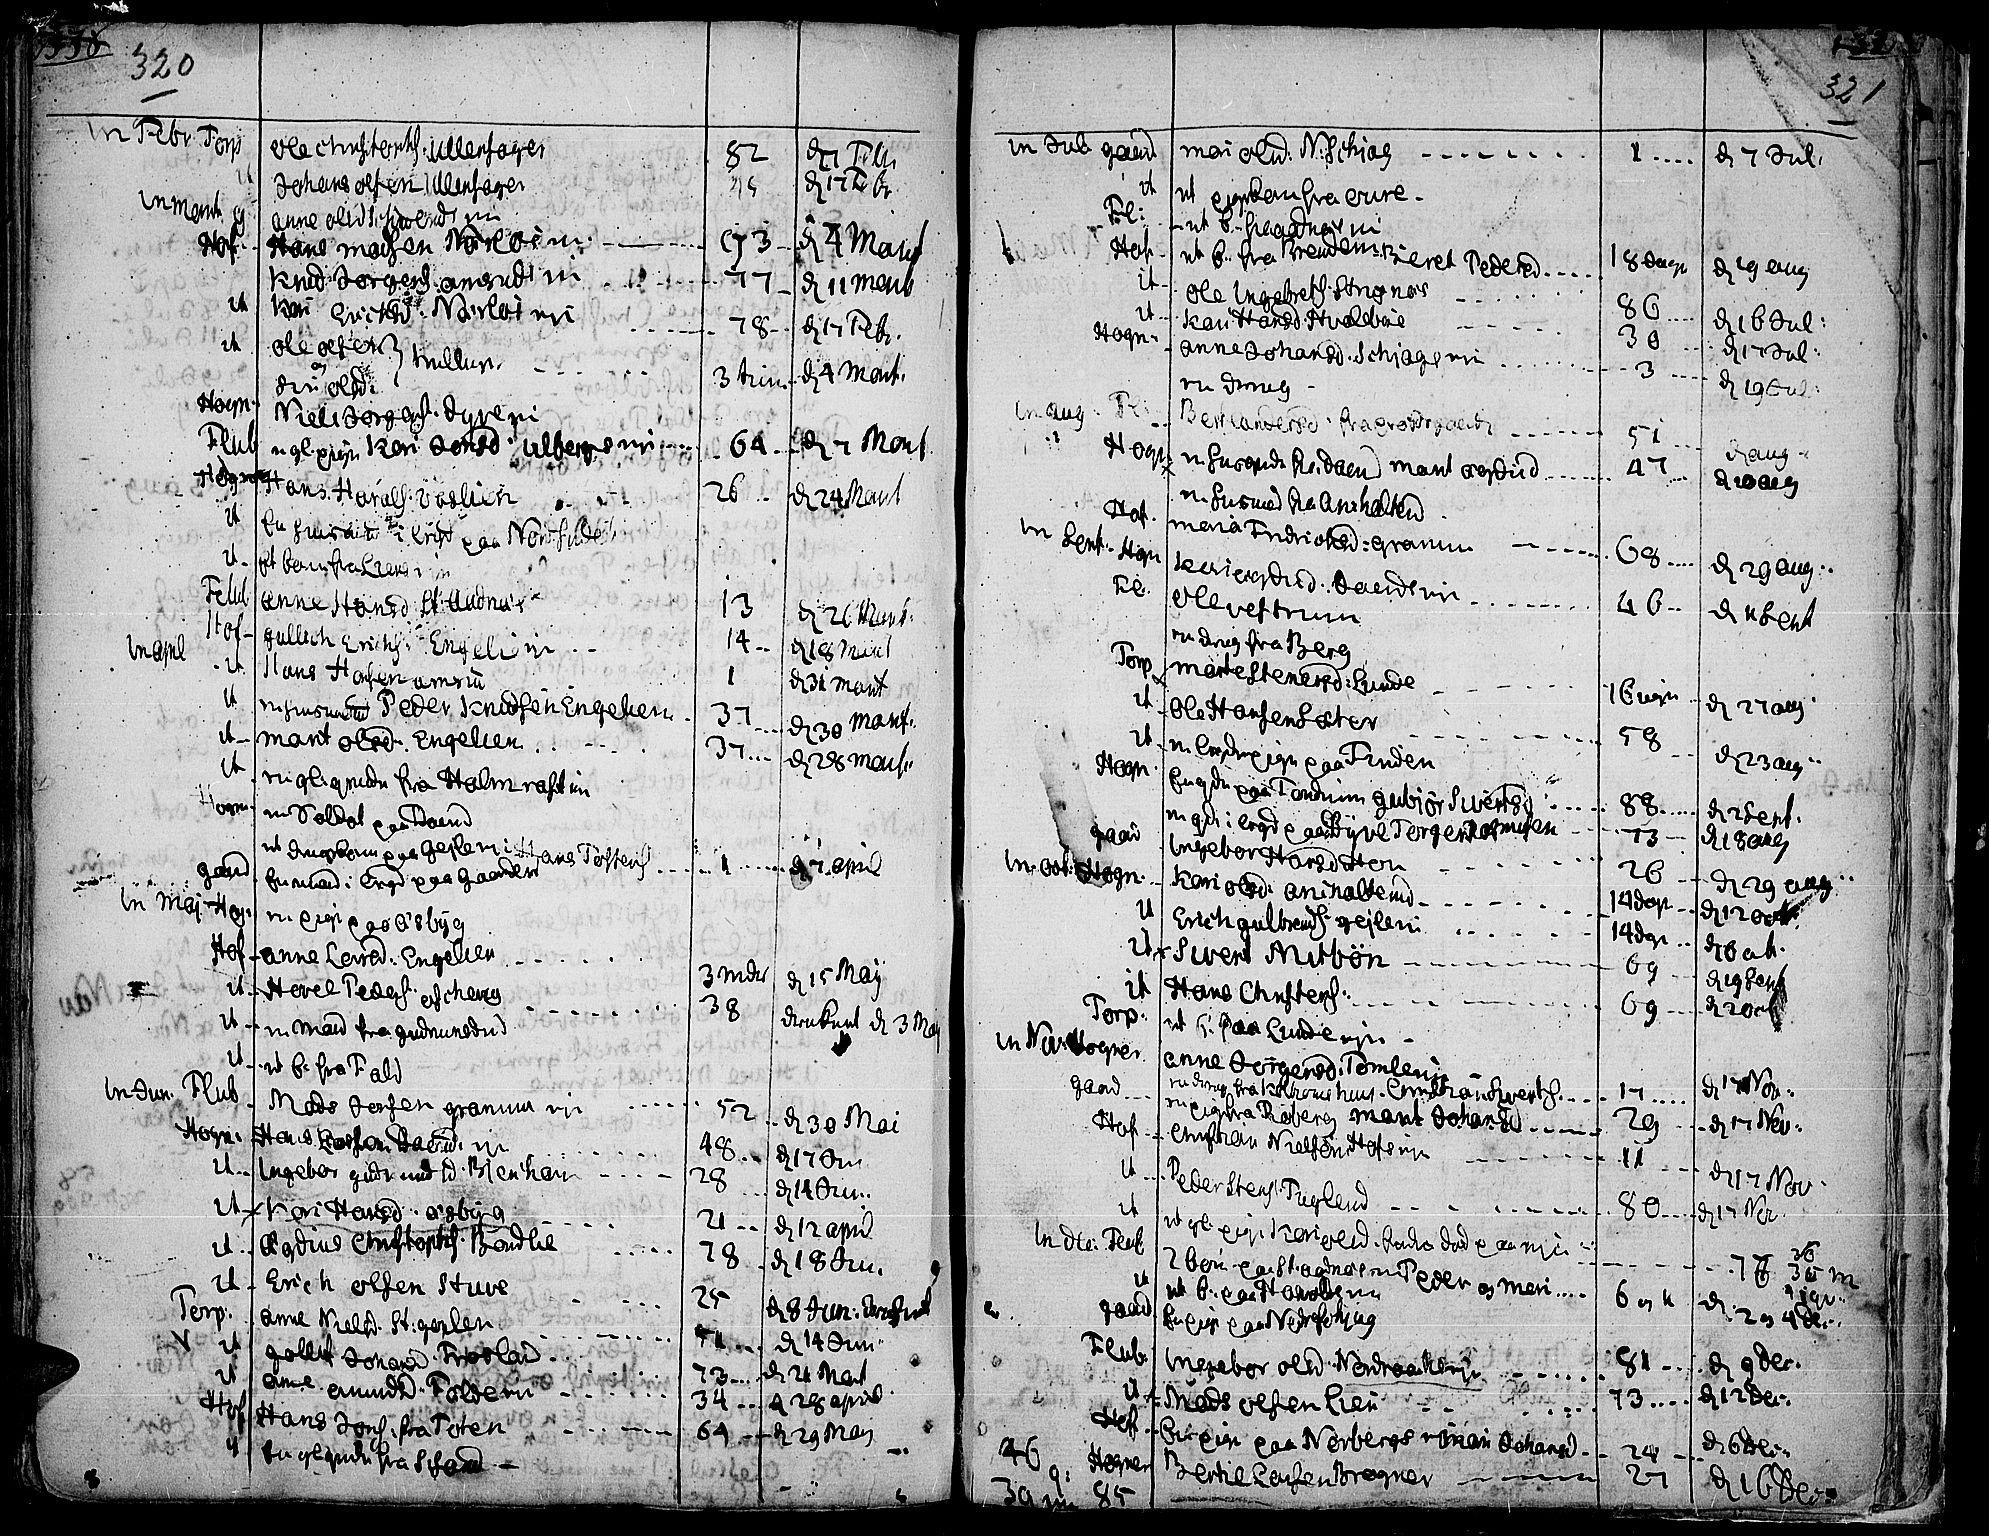 SAH, Land prestekontor, Ministerialbok nr. 5, 1765-1784, s. 320-321